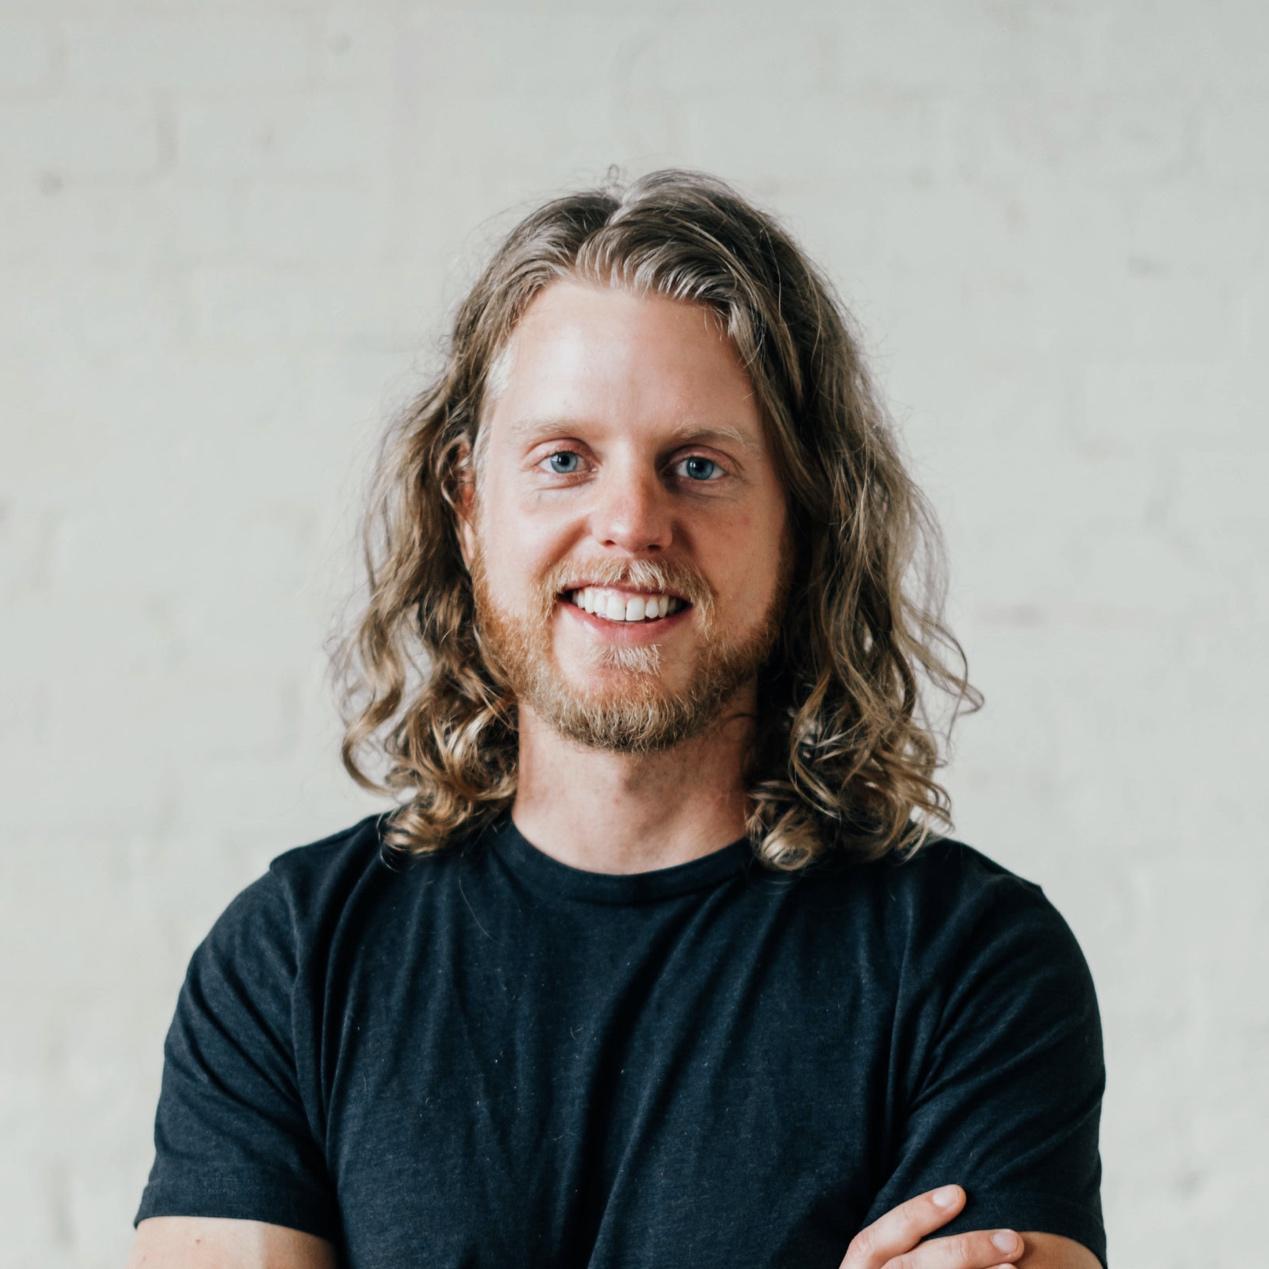 Josh Lashley- Audio/Video Team